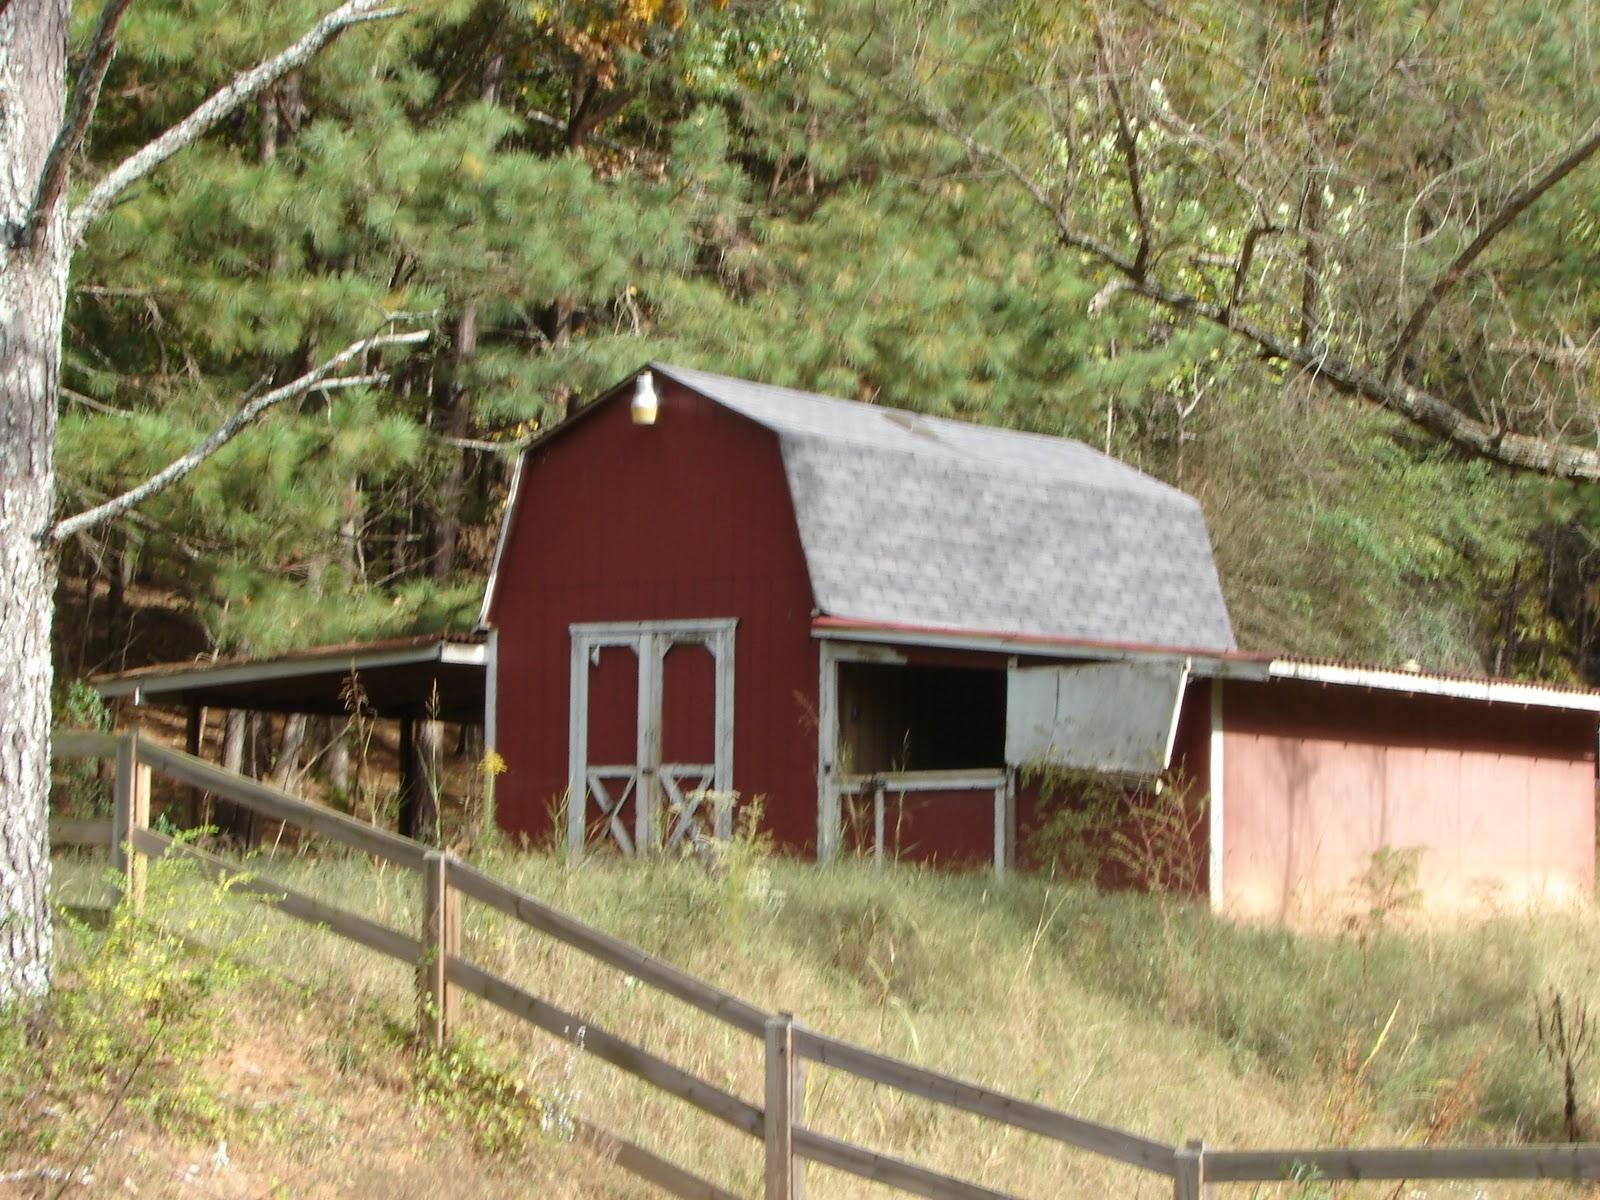 Real 2 Stall Horse Barn